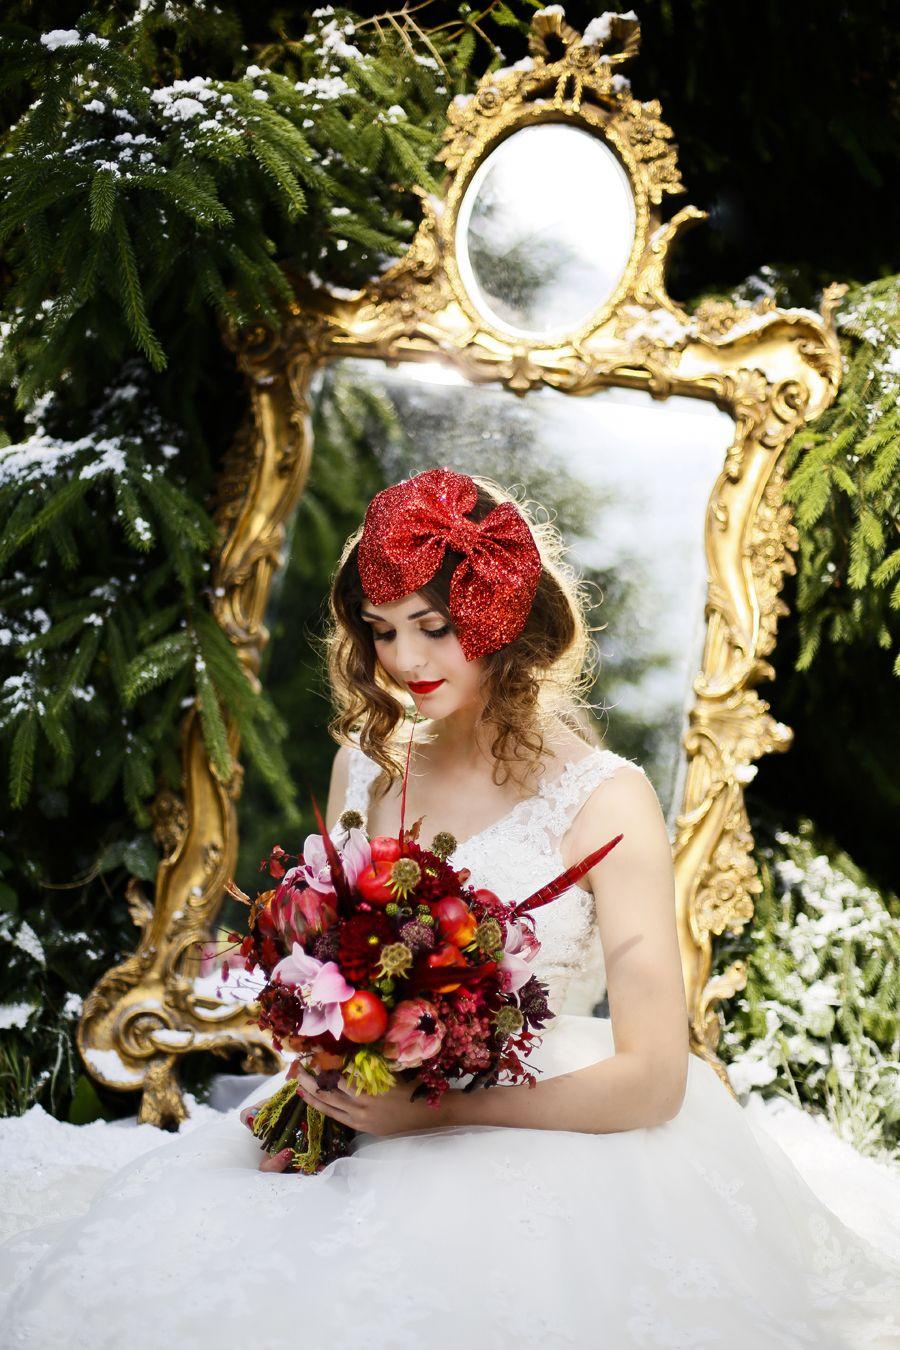 Snow White themed #vintage #wedding shoot by www.flowersbykirsty.com ...